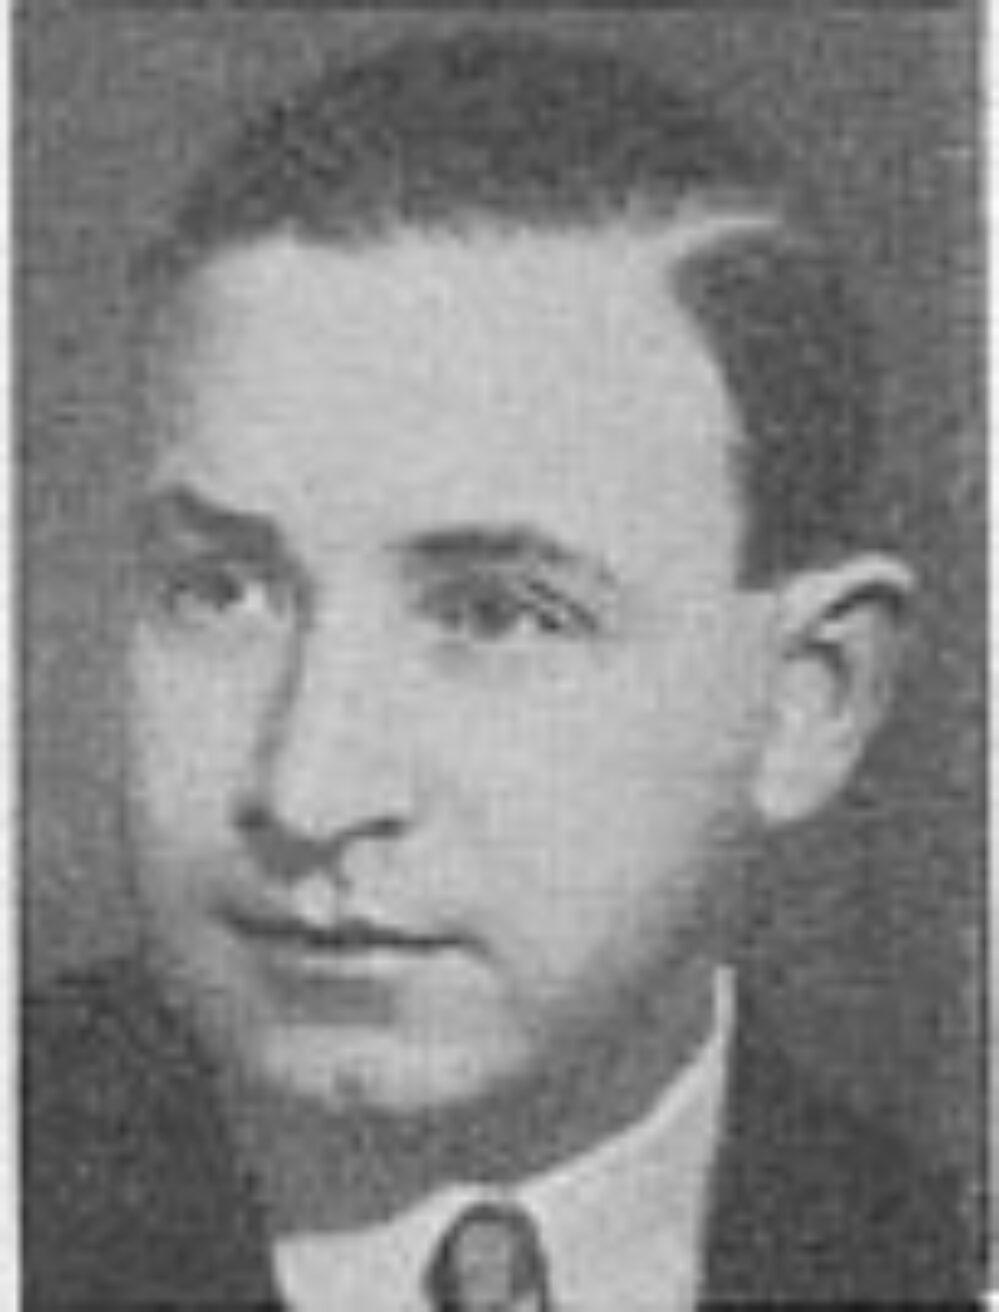 Johan Fladberg